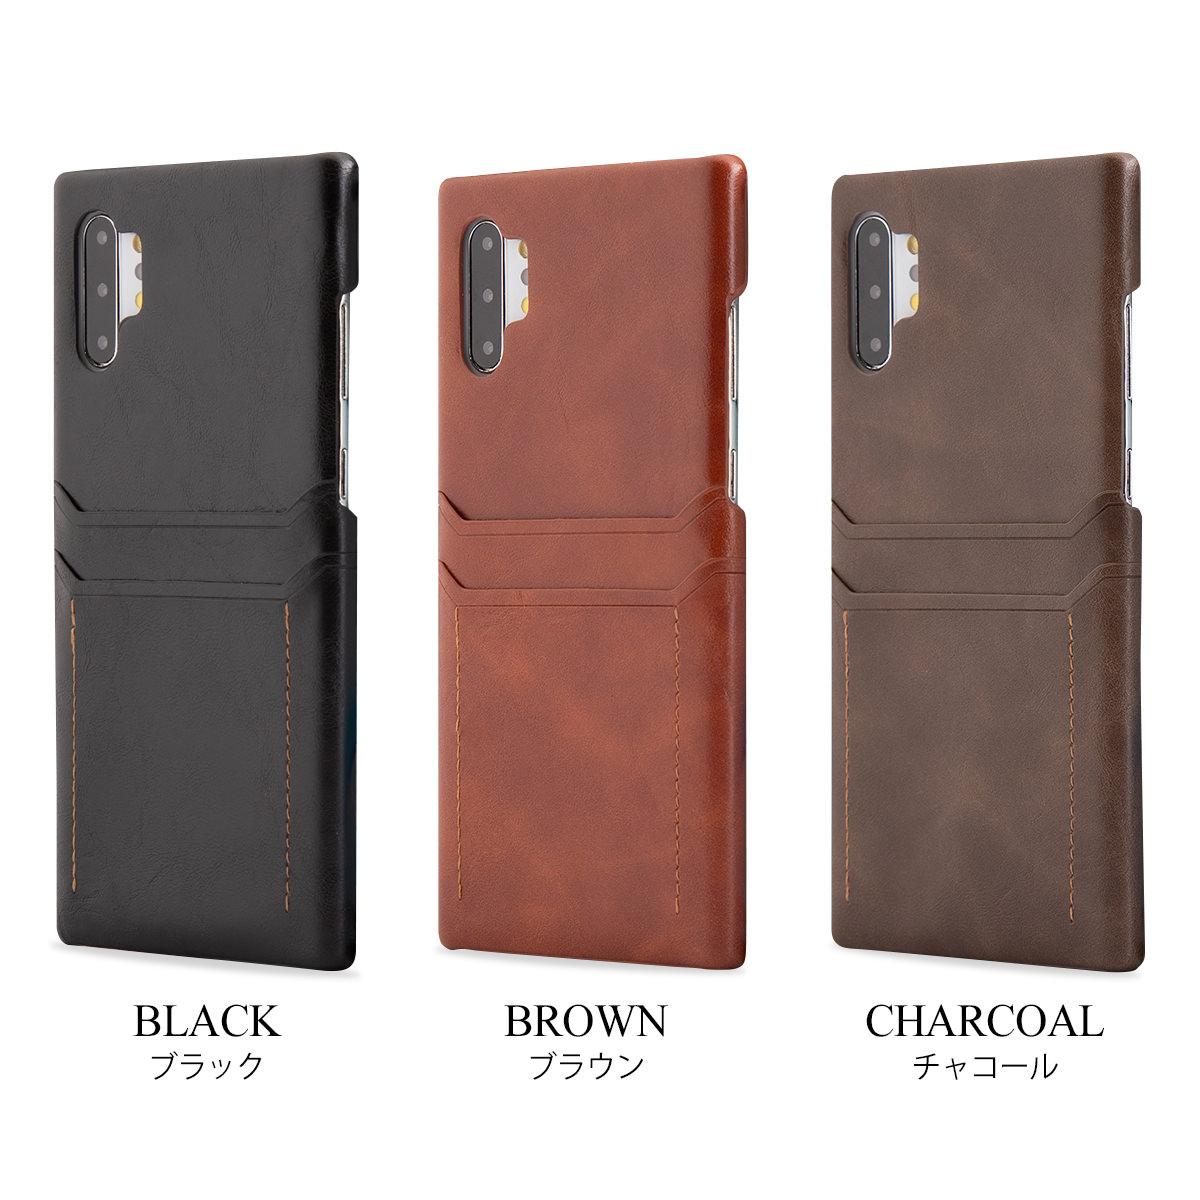 Galaxy Note10+ SC-01M SCV45 カードポケット付き レザー ハードケース エクスペリア xperia sov42 902so au ワイモバイル